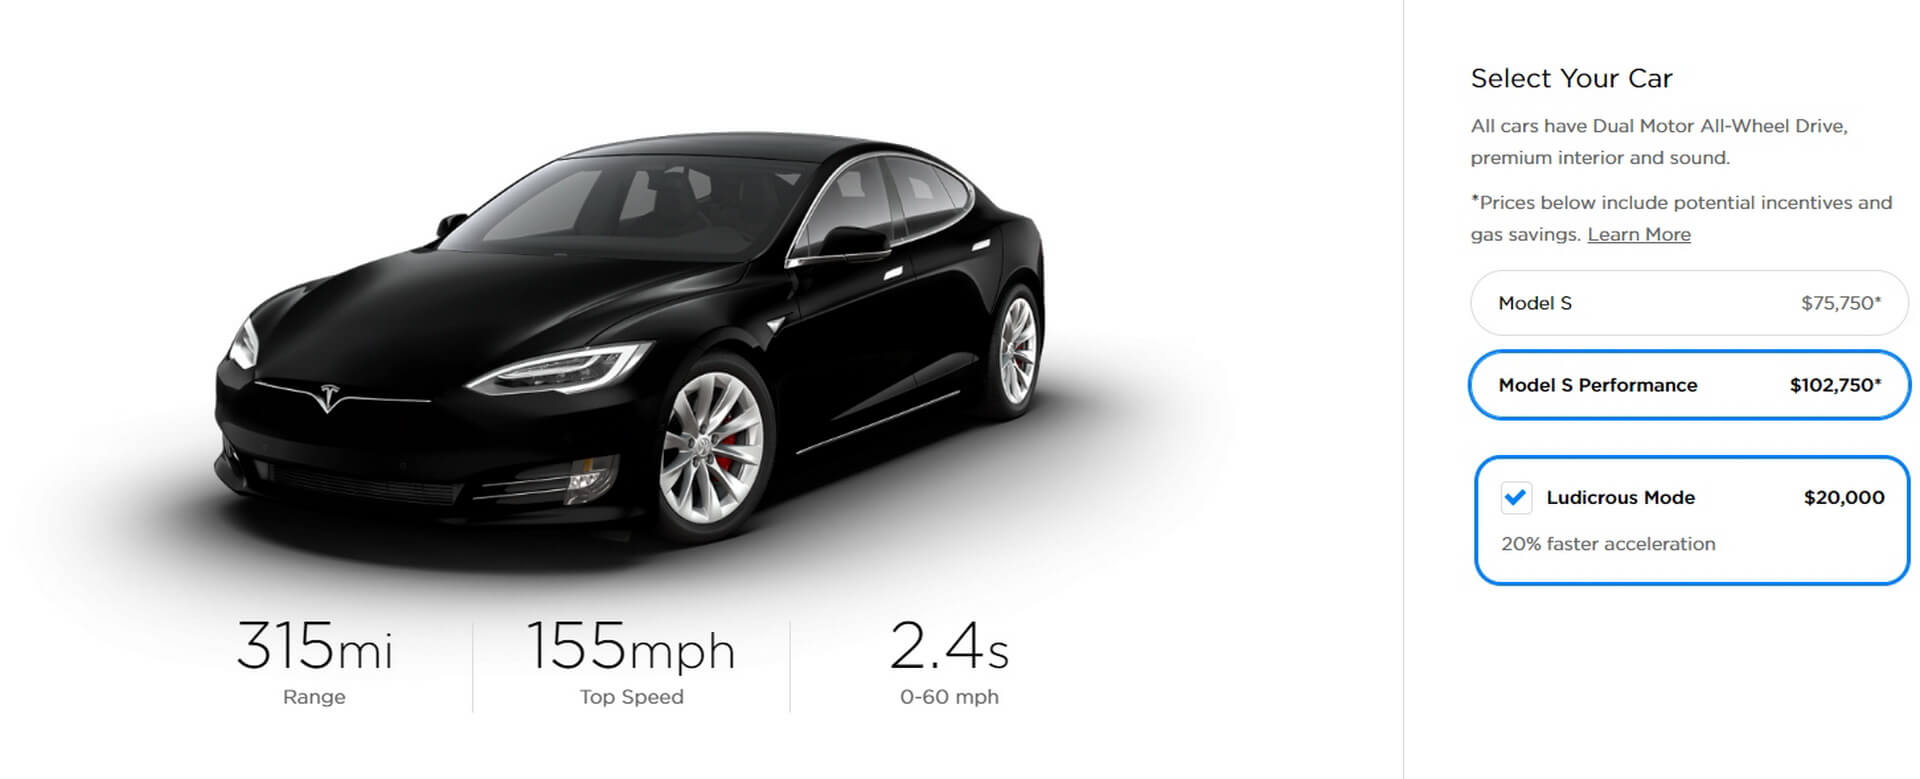 Tesla Model SPerformance + «Ludicrous Mode»